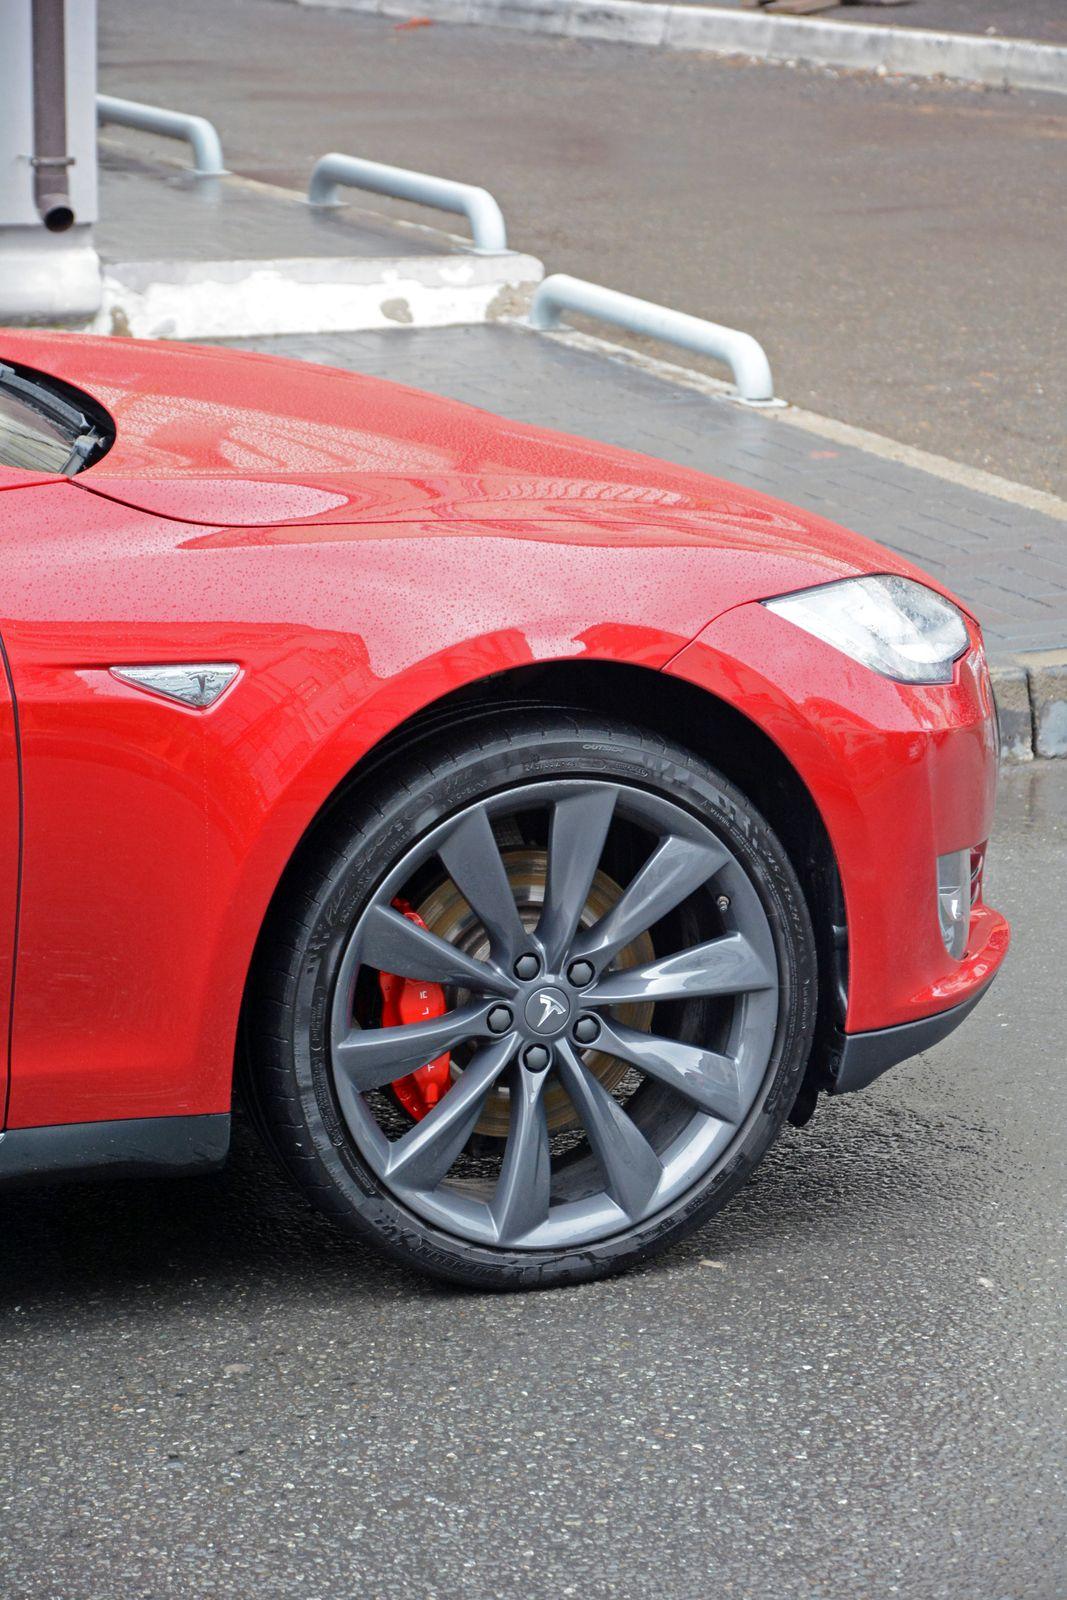 Даже на дисках R21 Tesla весьма комфортна.